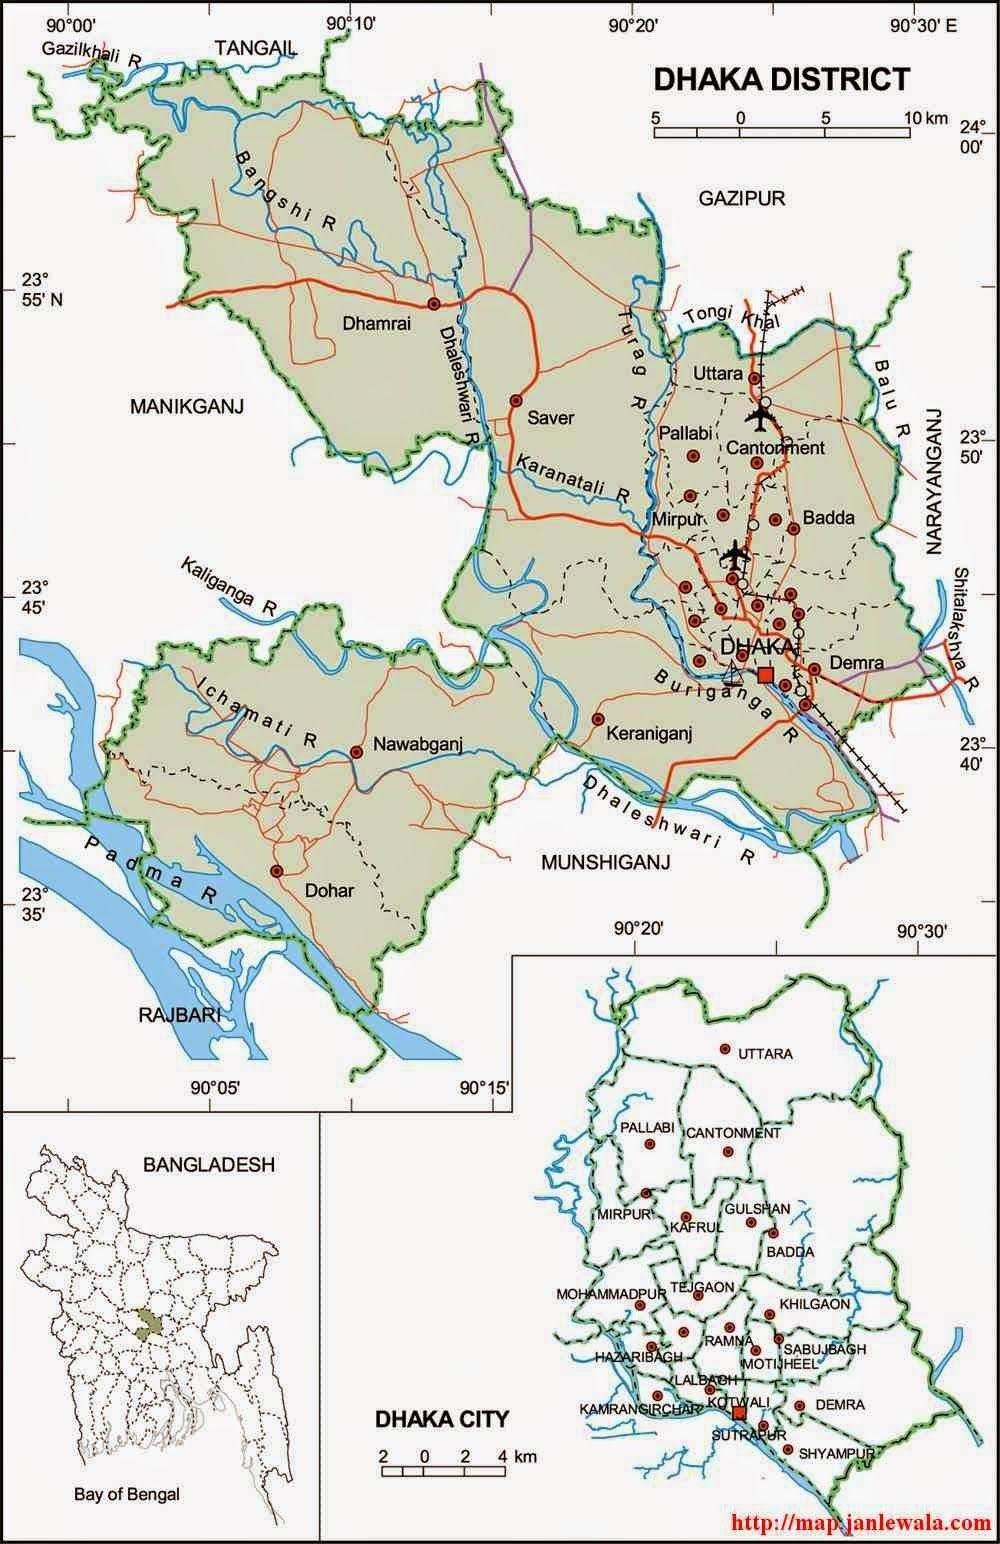 bangladesh map dhaka division Dhaka Zila Map Dhaka Division Bangladesh Dhaka Map Bangladesh bangladesh map dhaka division